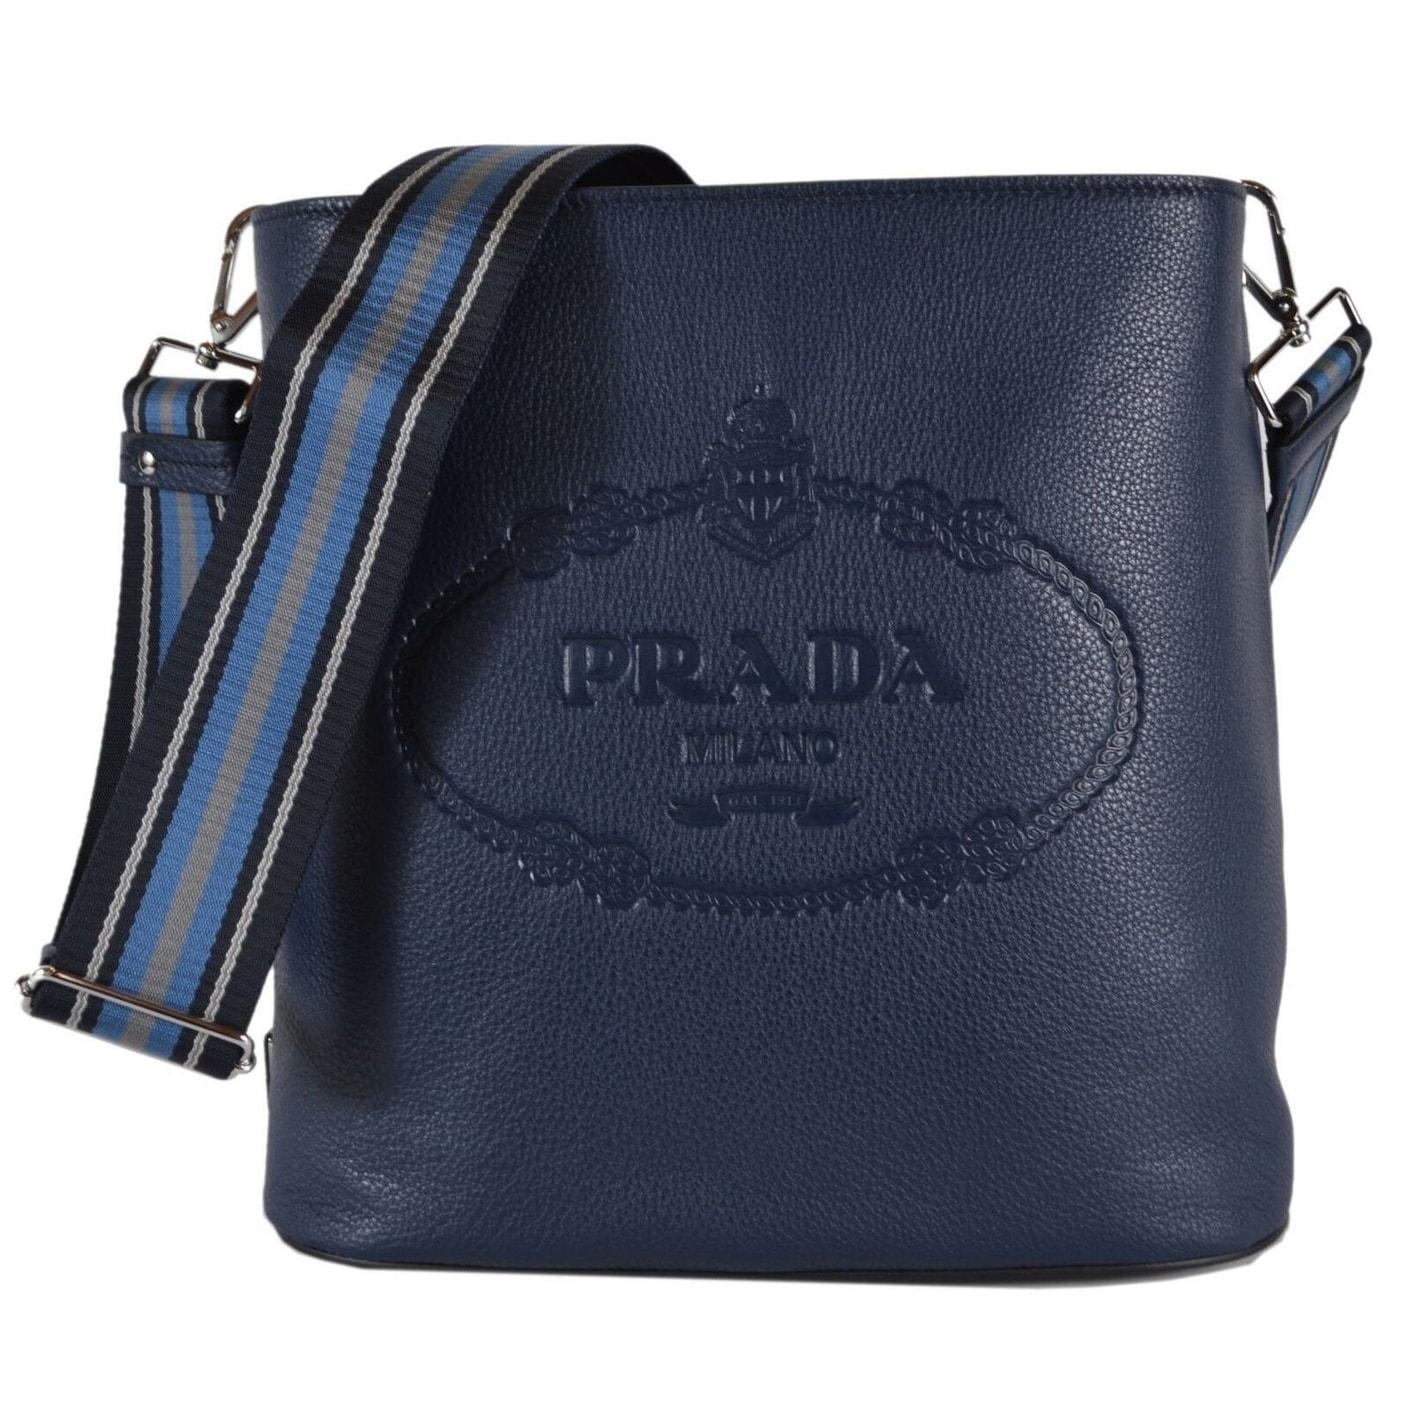 77d64f3043d8 Prada Designer Handbags | Find Great Designer Store Deals Shopping ...